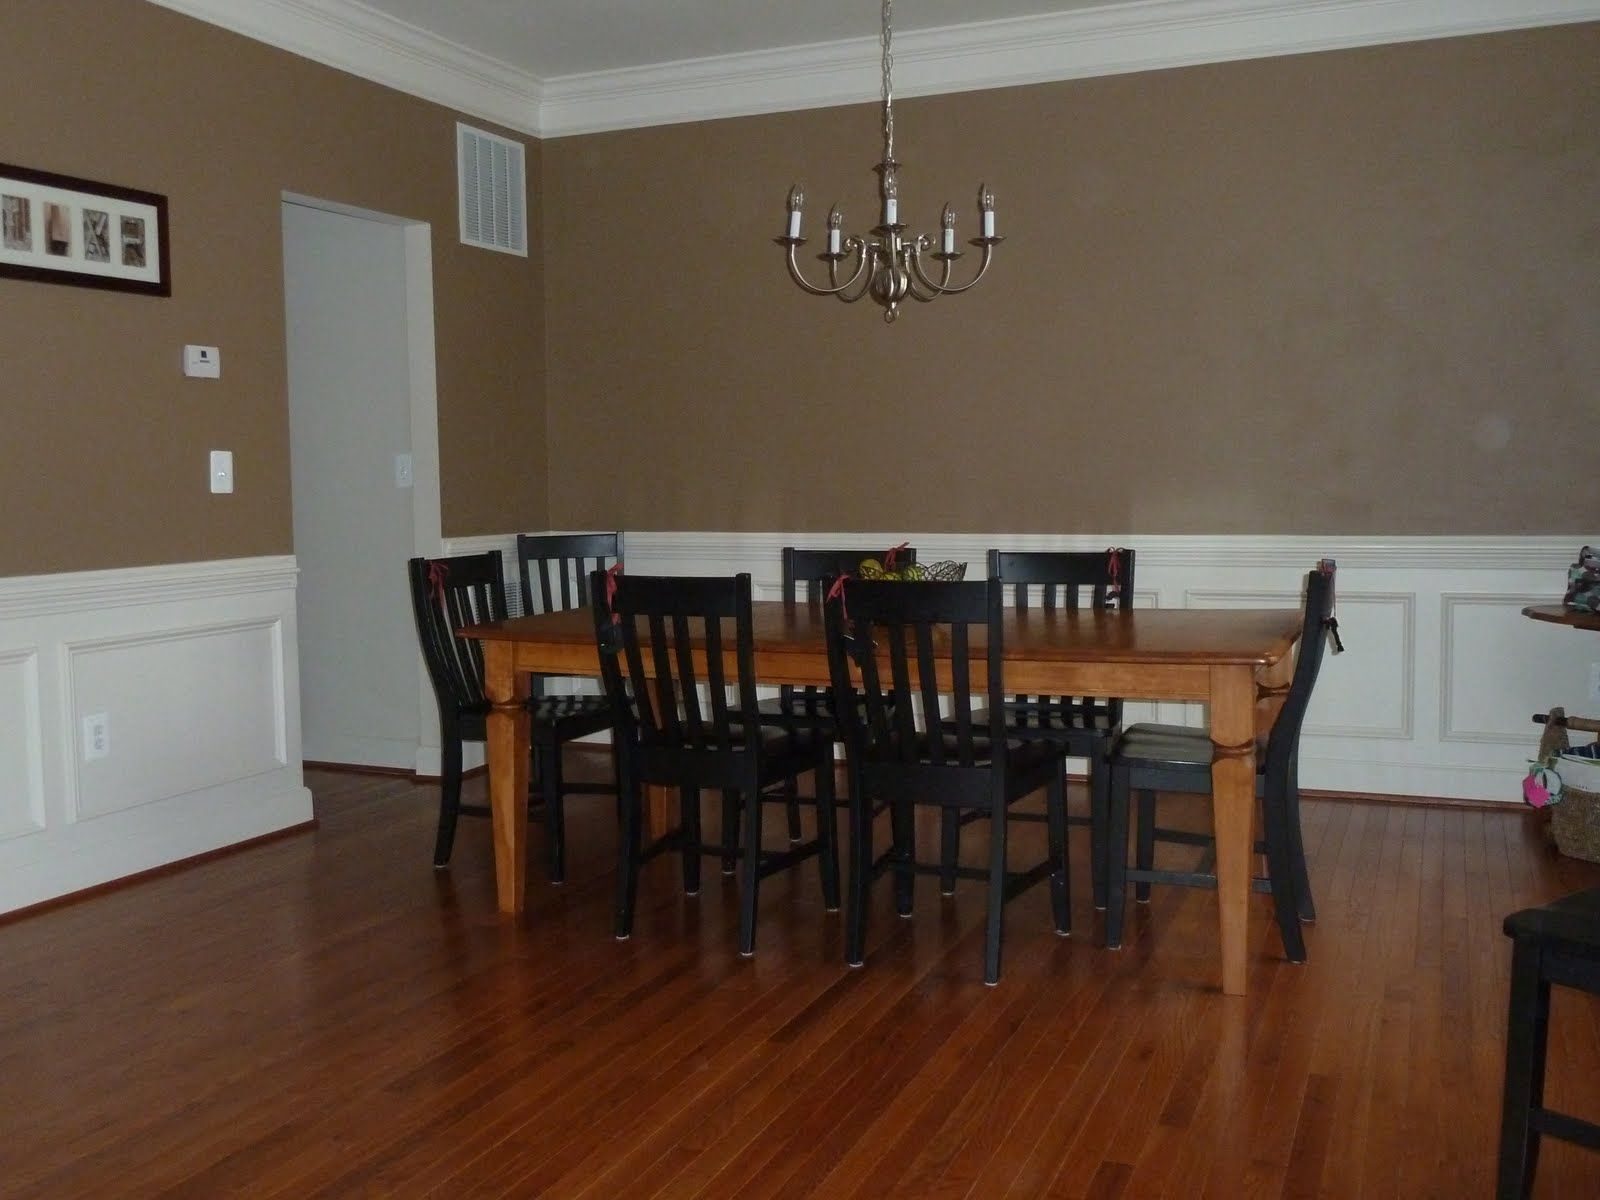 cool dining room ideas #diningroom #diningcabinet #diningtable